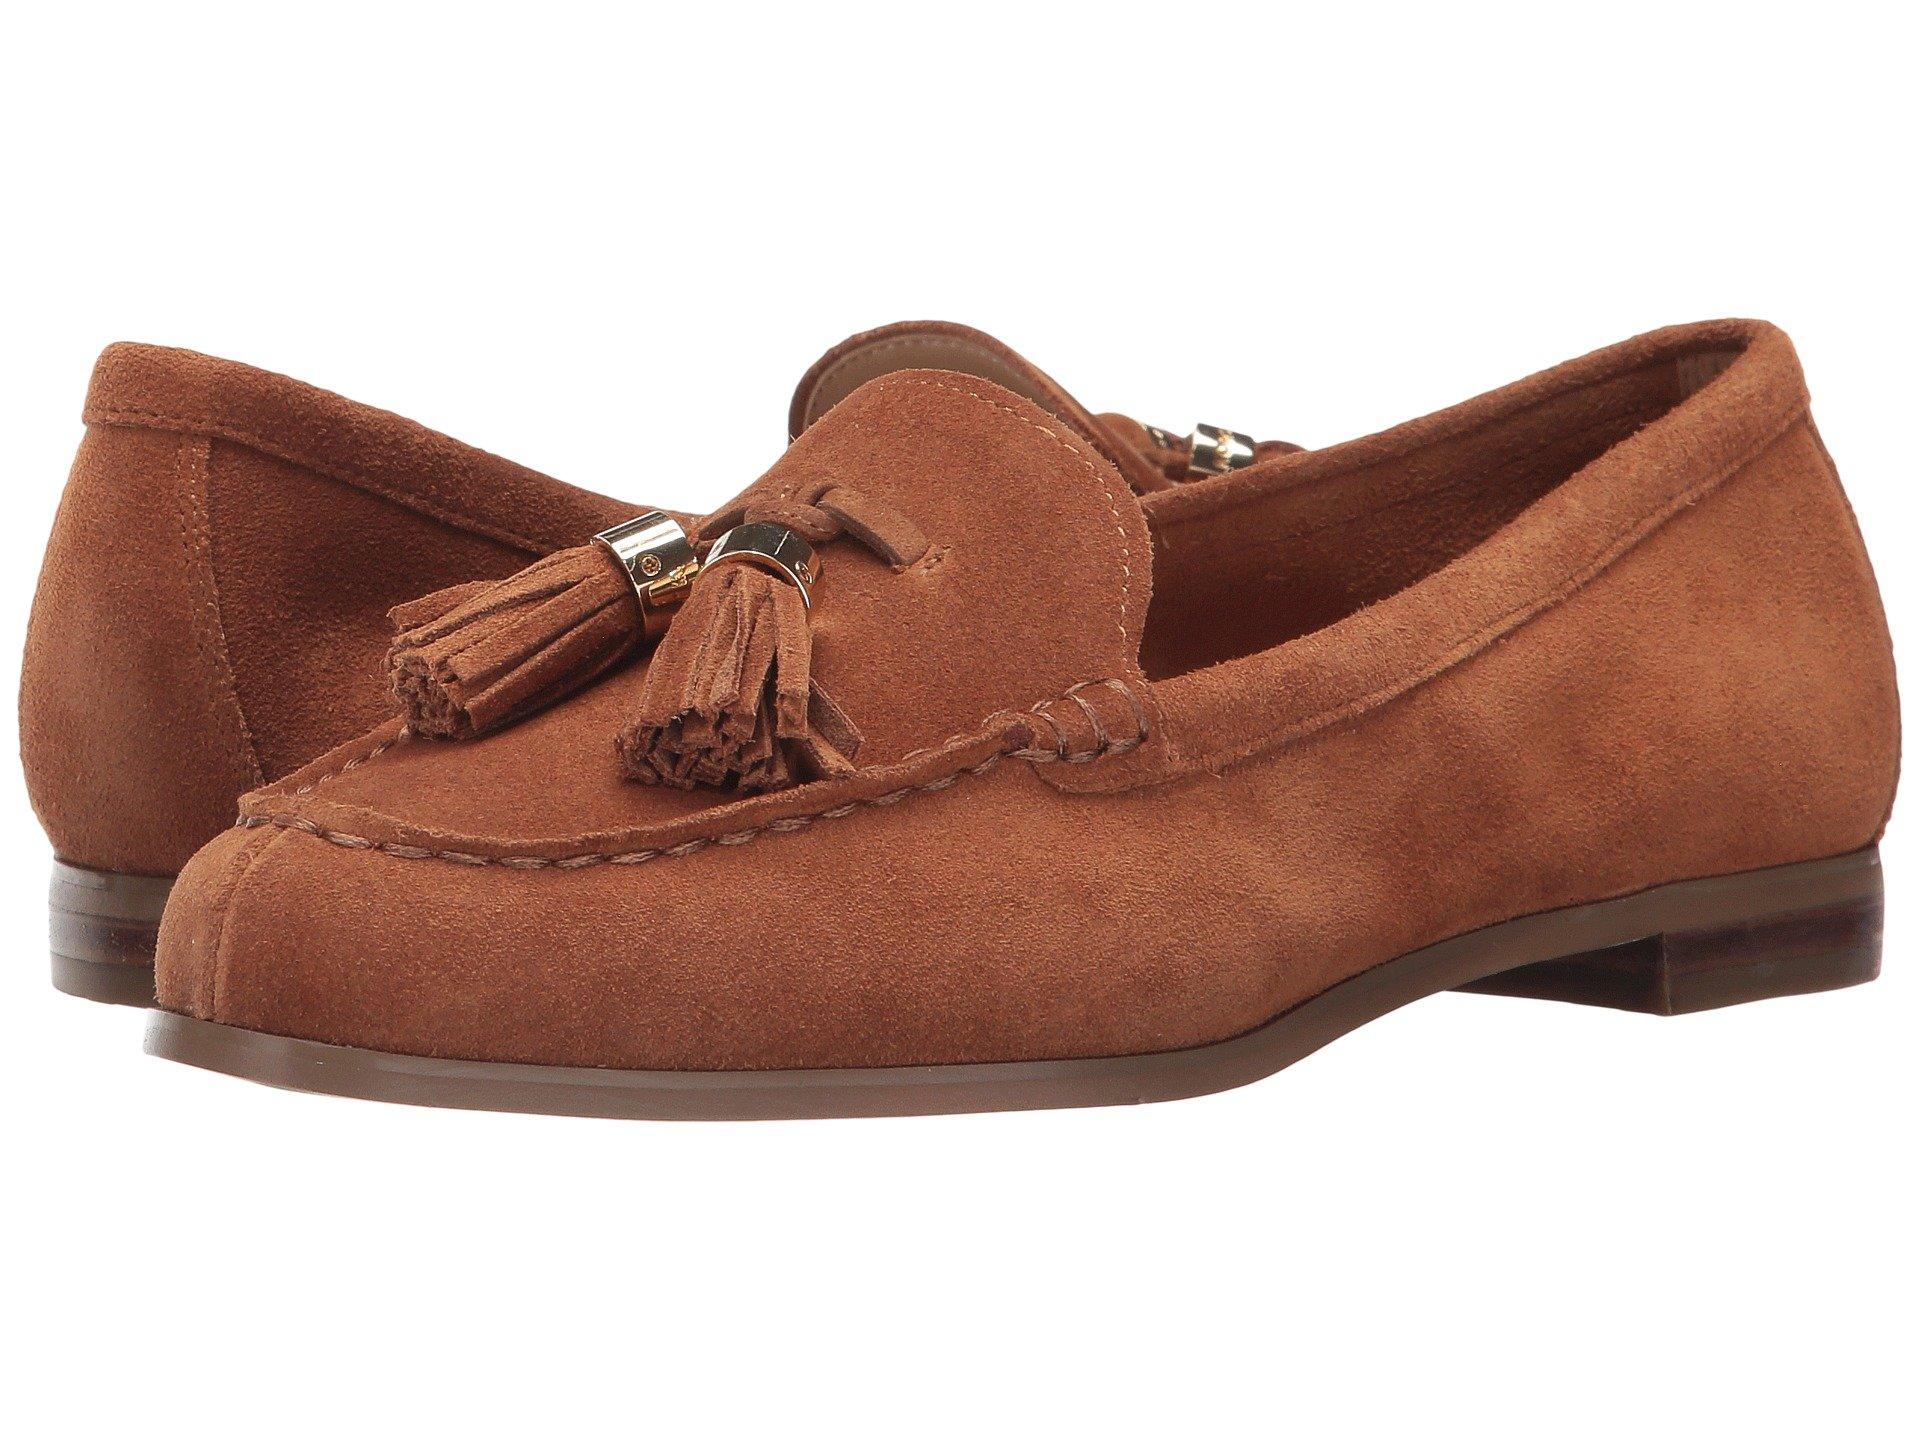 Callahan Loafer, Acorn